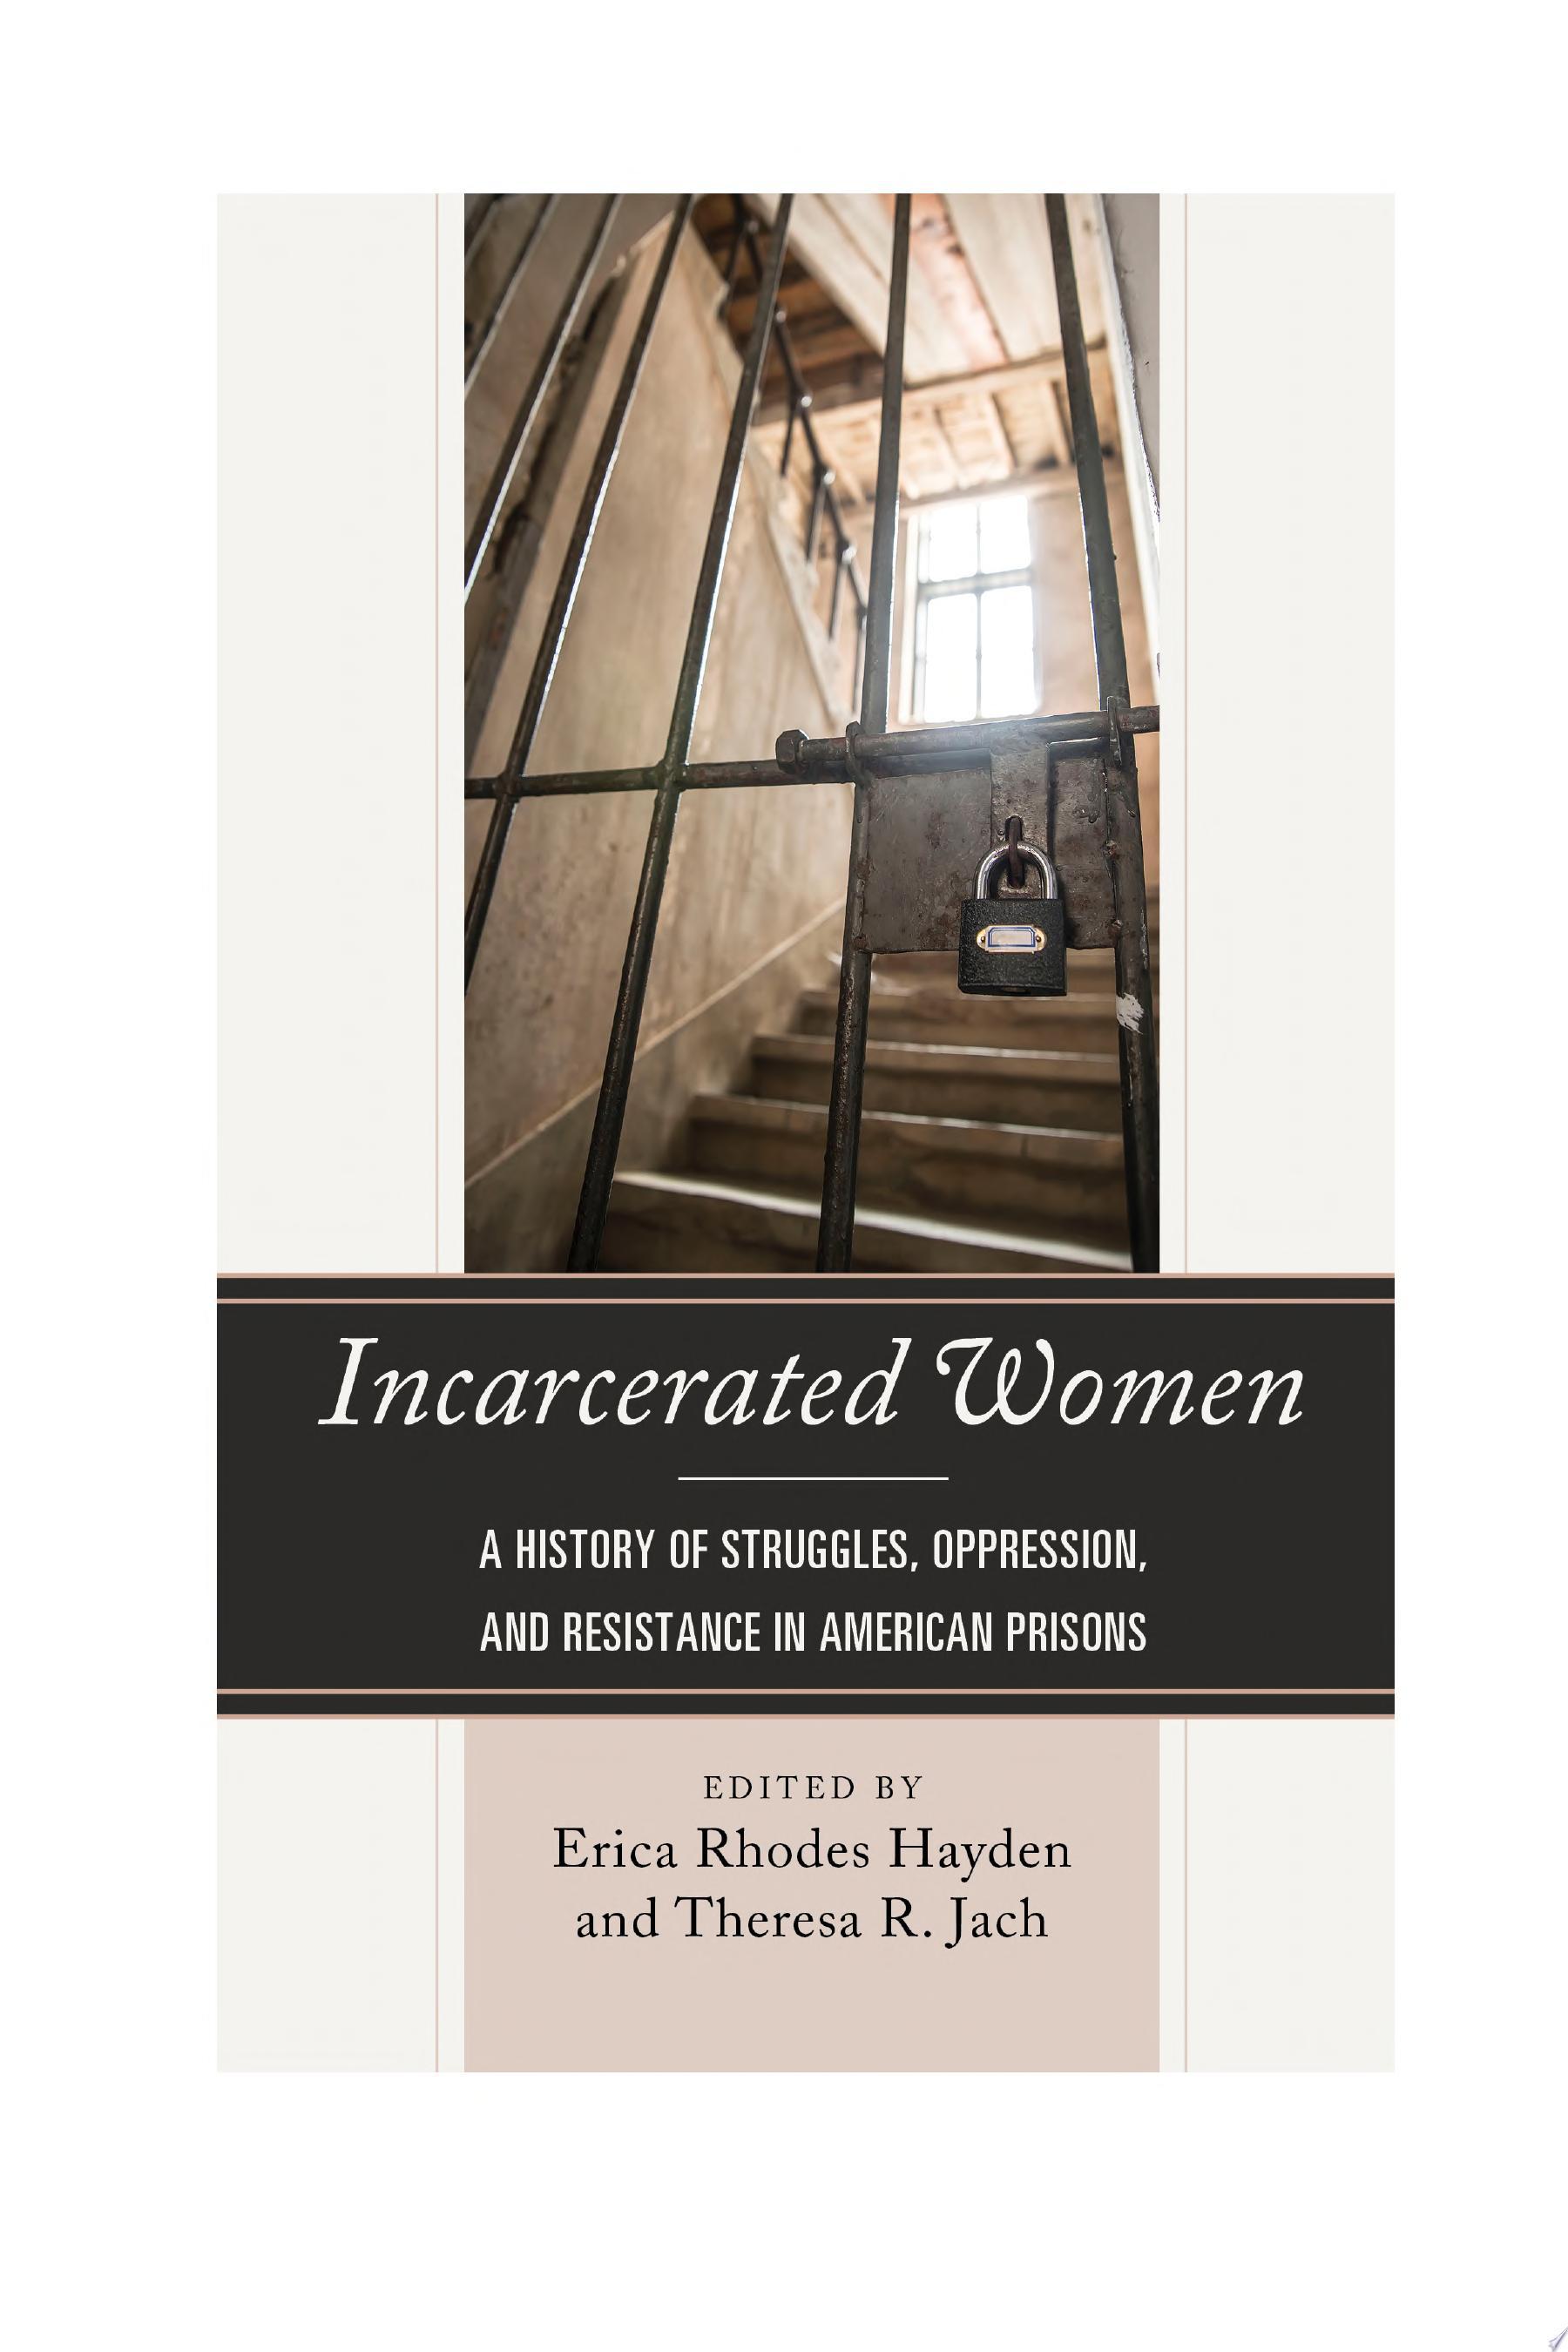 Incarcerated Women